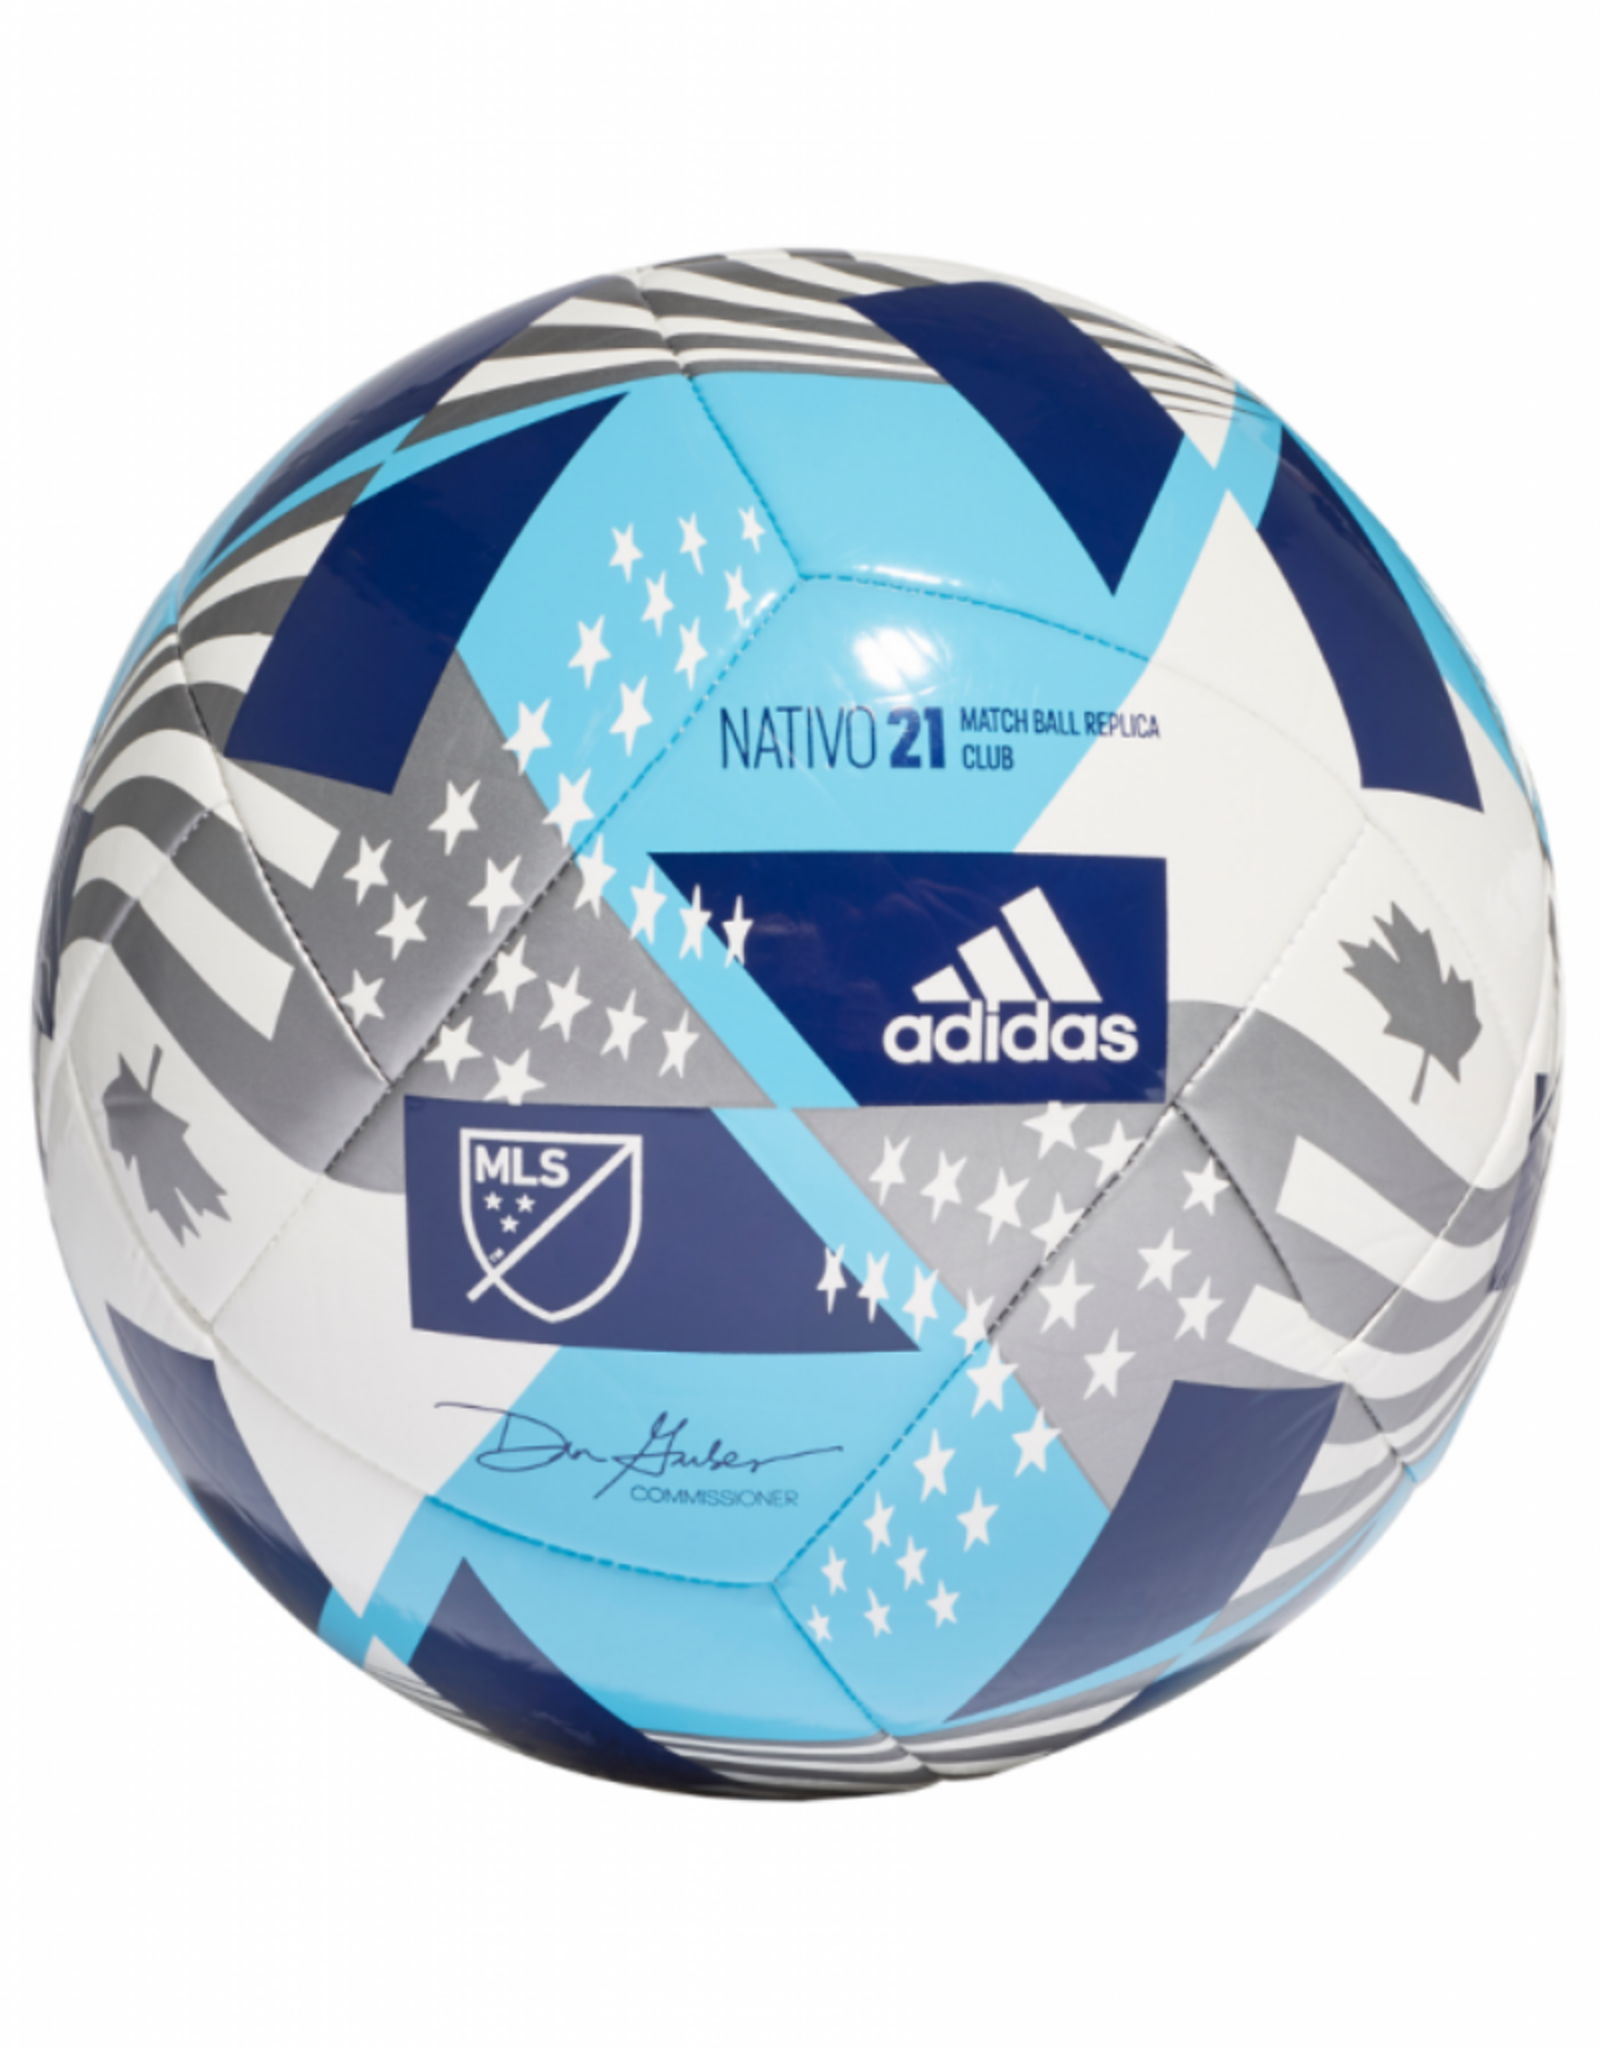 Adidas Adidas 2021 MLS Club Soccer Ball Size 5 Blue/White